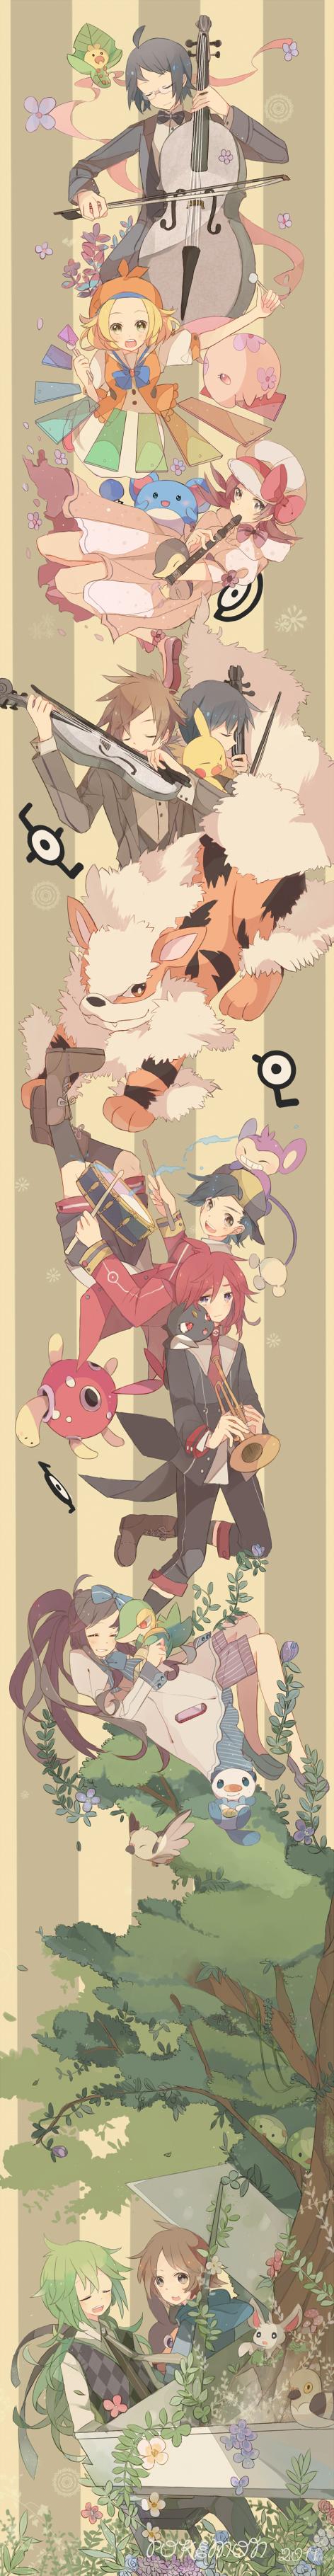 Tags: Anime, Kashi (Bluenest+), Pokémon, Marill, Sneasel, Snivy, Hibiki (Pokémon), Minccino, Shuckle, Green (Pokémon), N (Pokémon), Oshawott, Cyndaquil